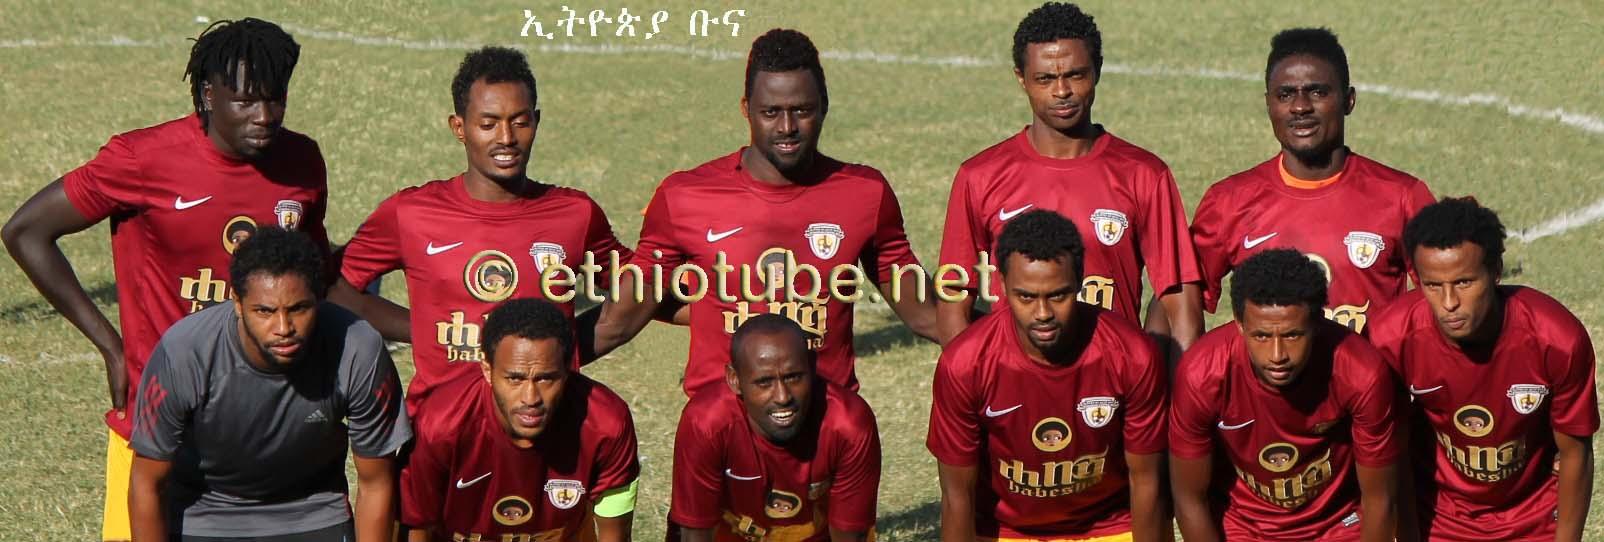 Ethio. Coffee team - 2014 City cup Semi finalist